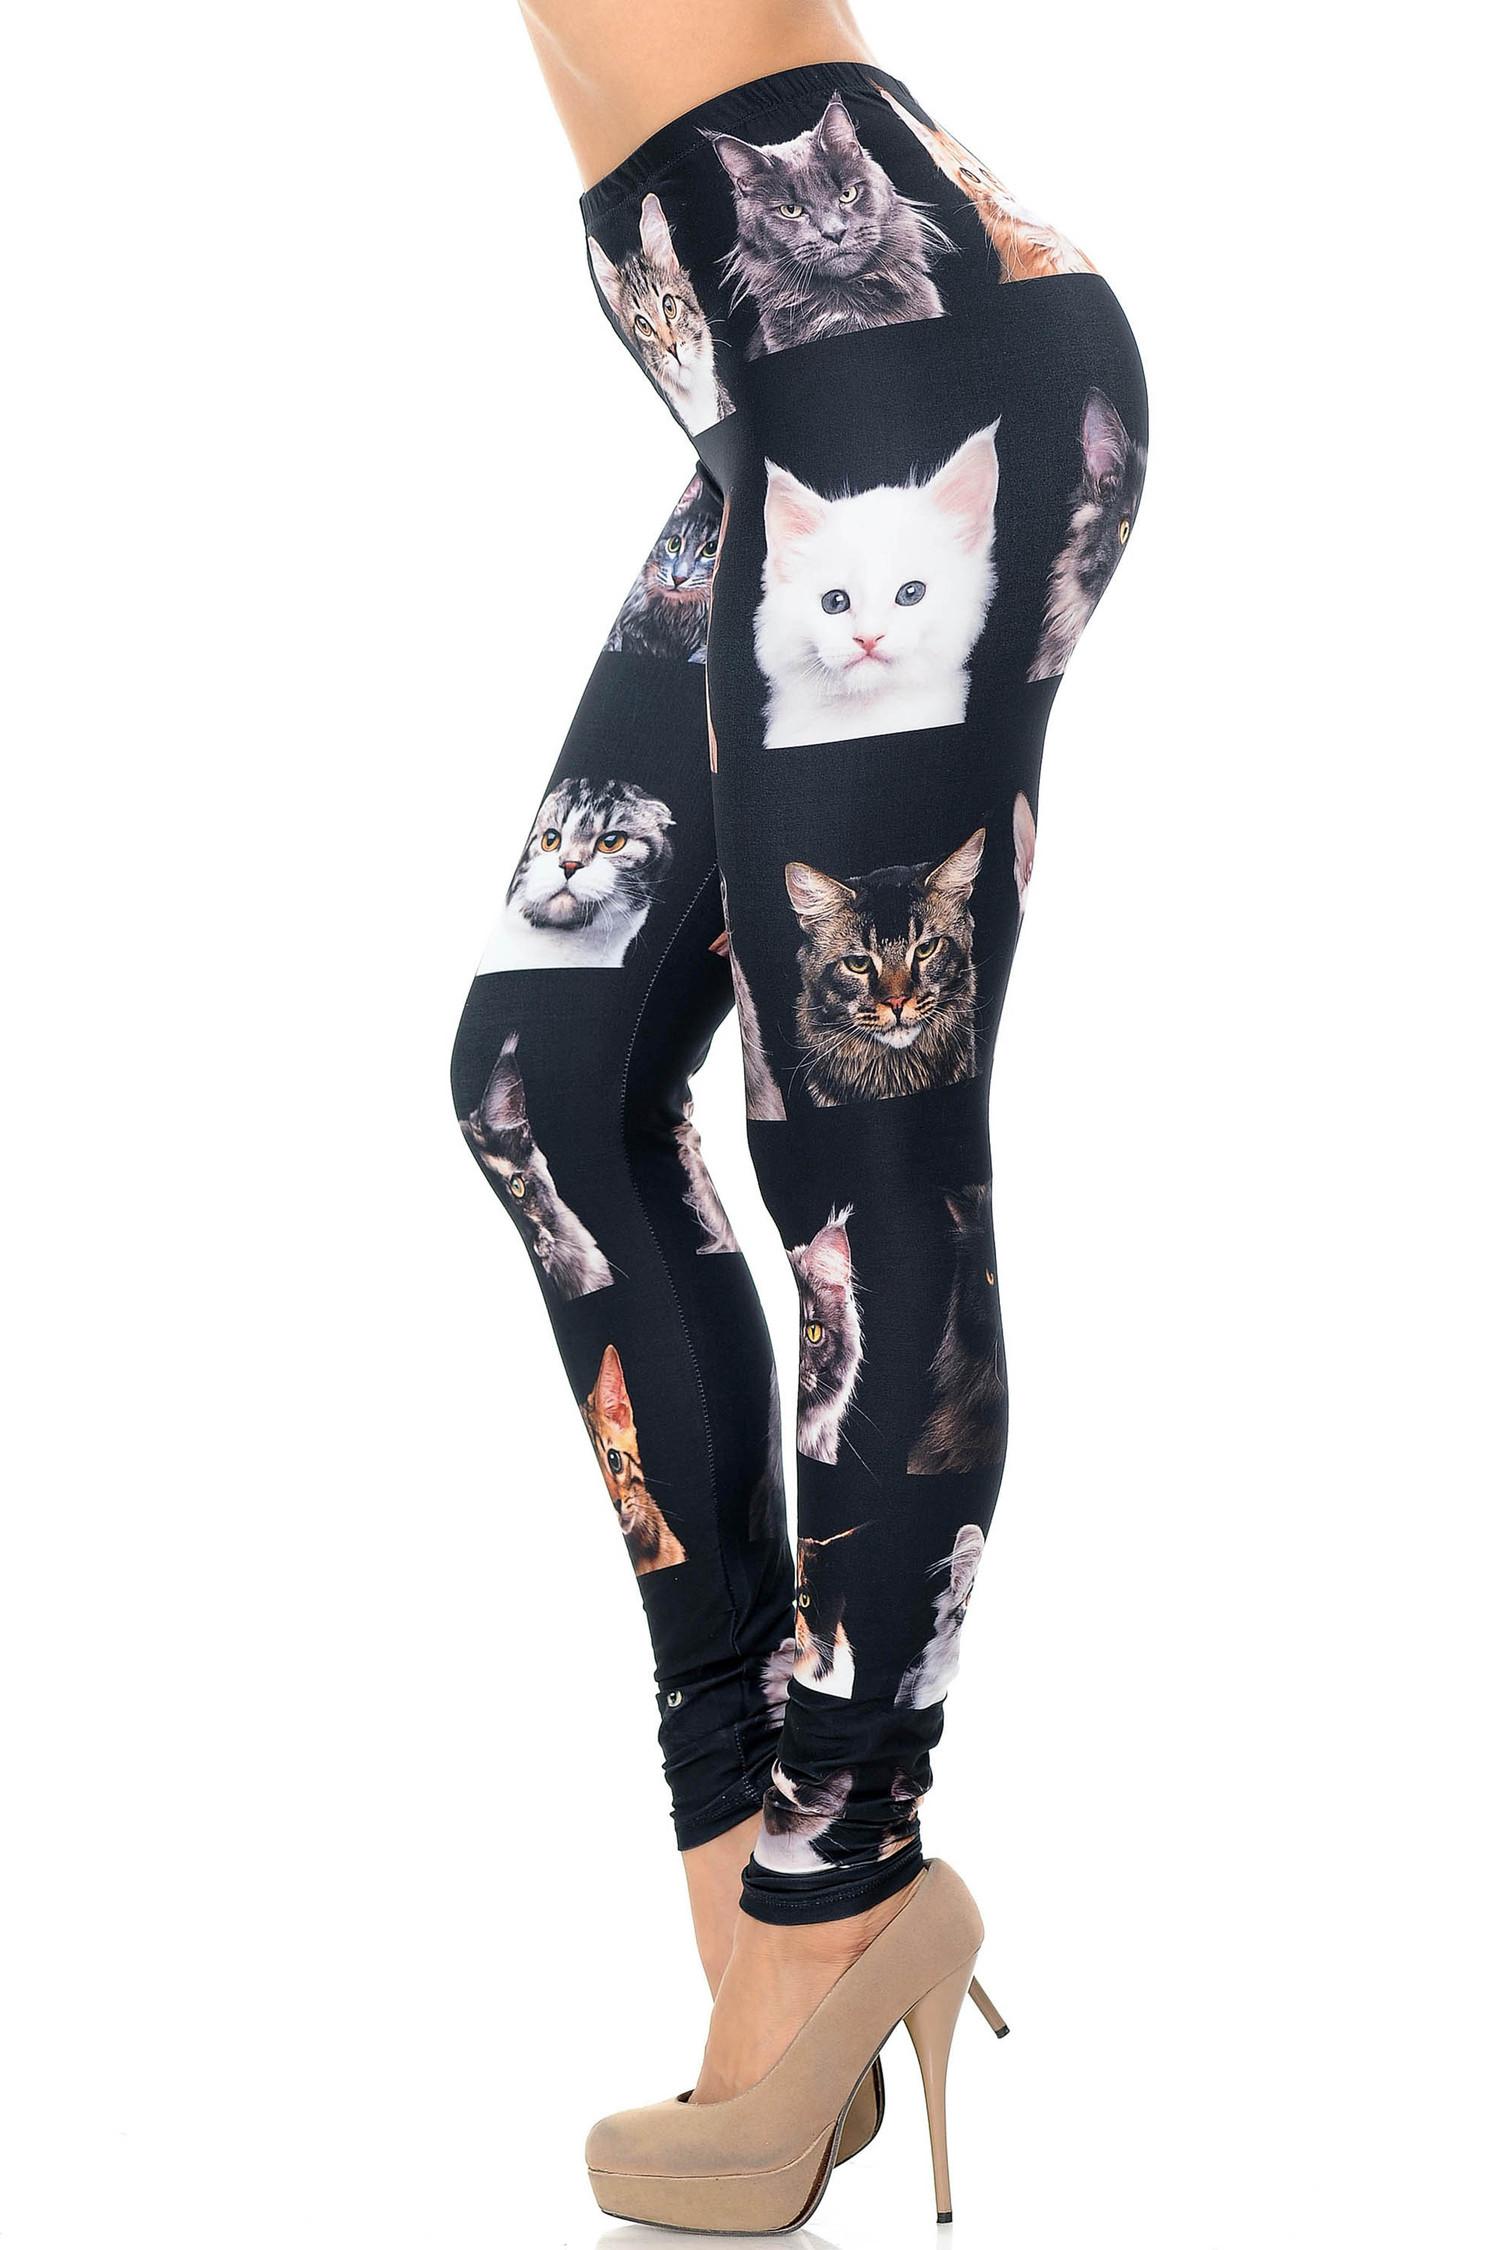 Creamy Soft Cute Kitty Cat Faces Extra Plus Size Leggings - USA Fashion™